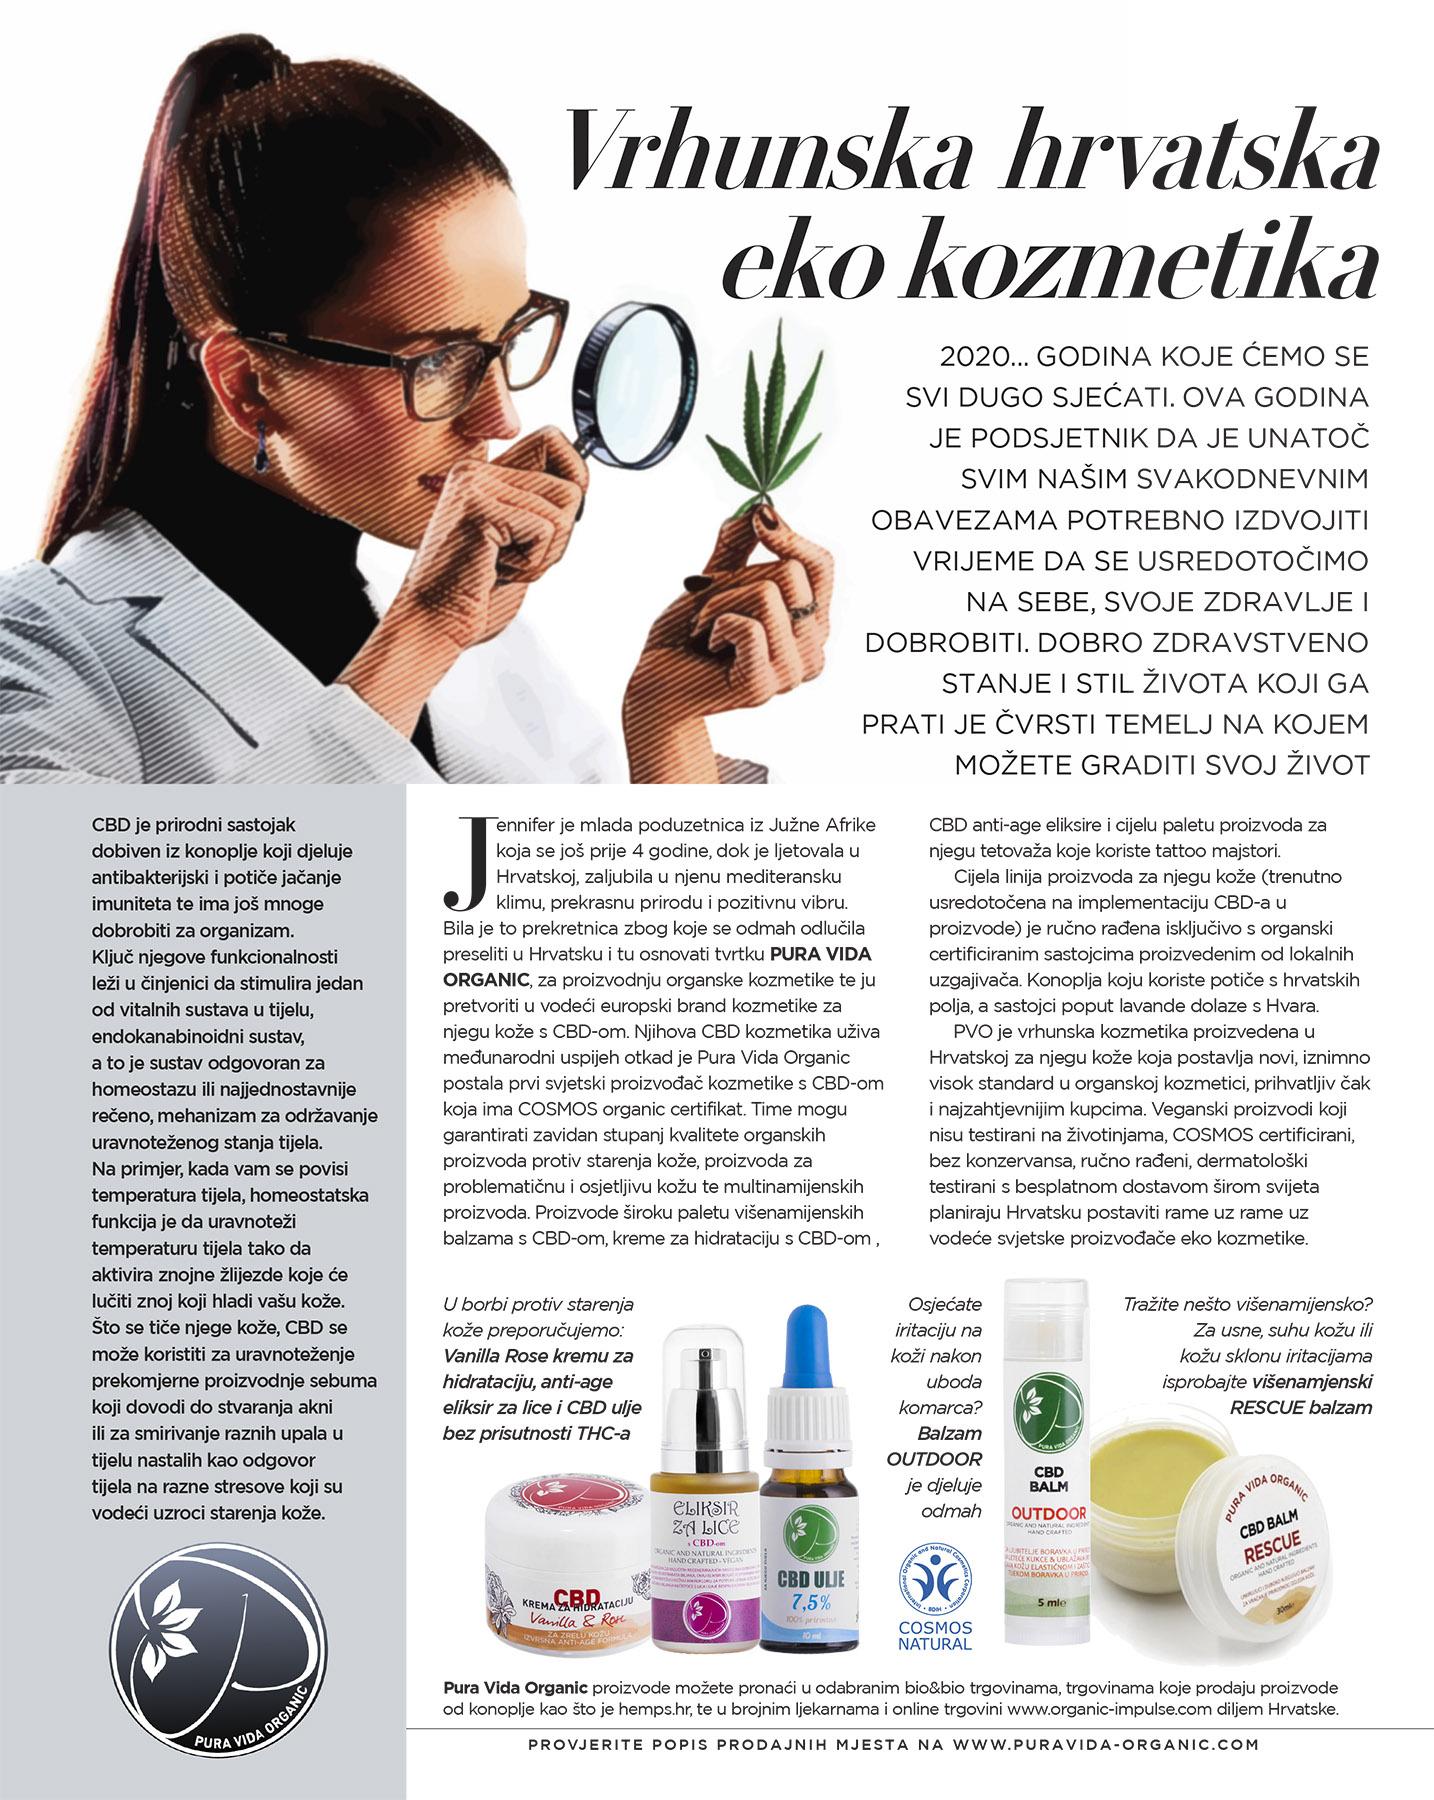 Gloria hr magazine article on puravida organic cbd skincare